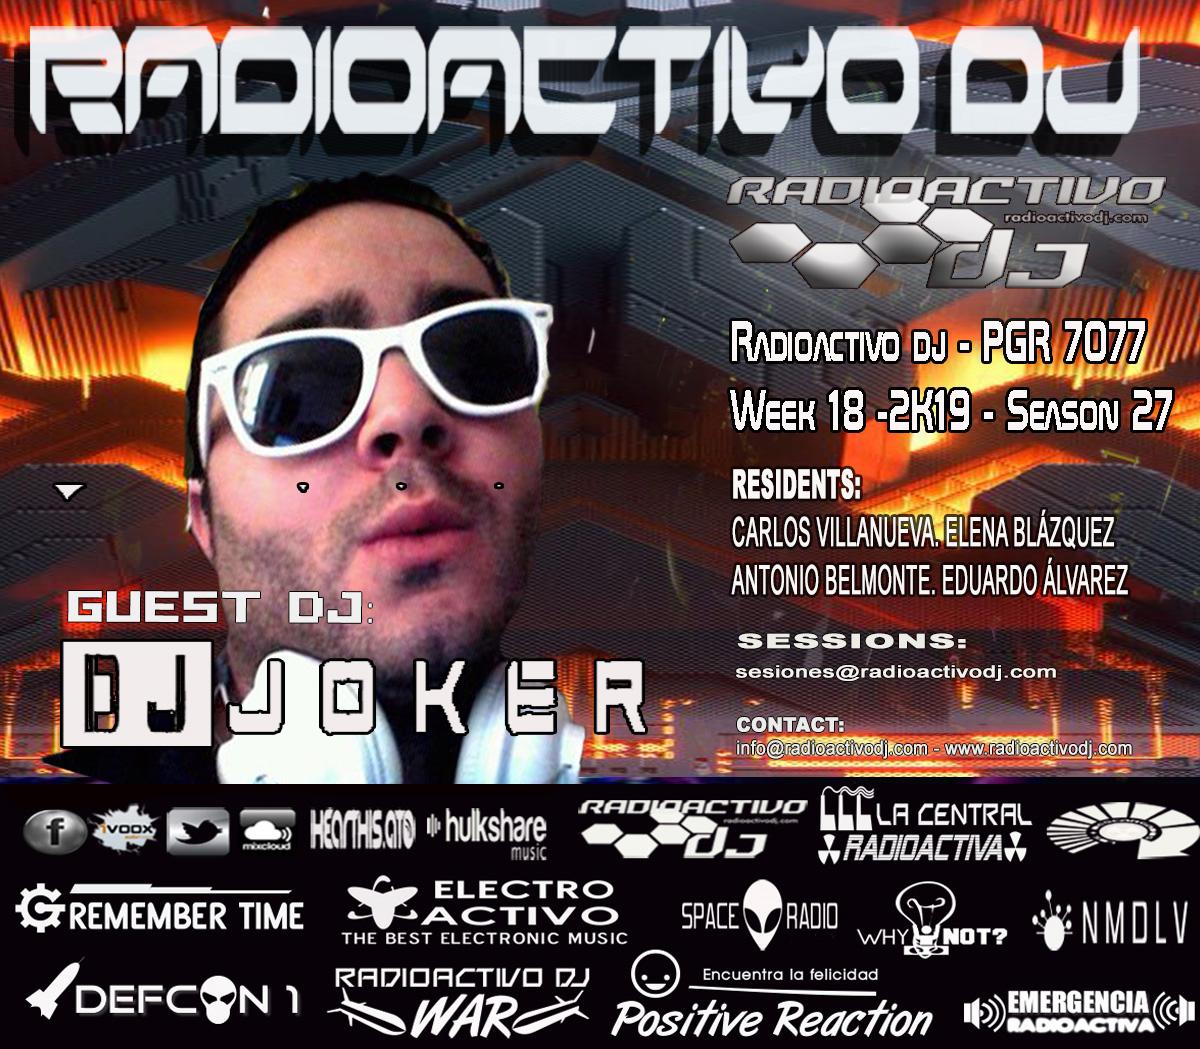 RADIOACTIVO-DJ-18-2019